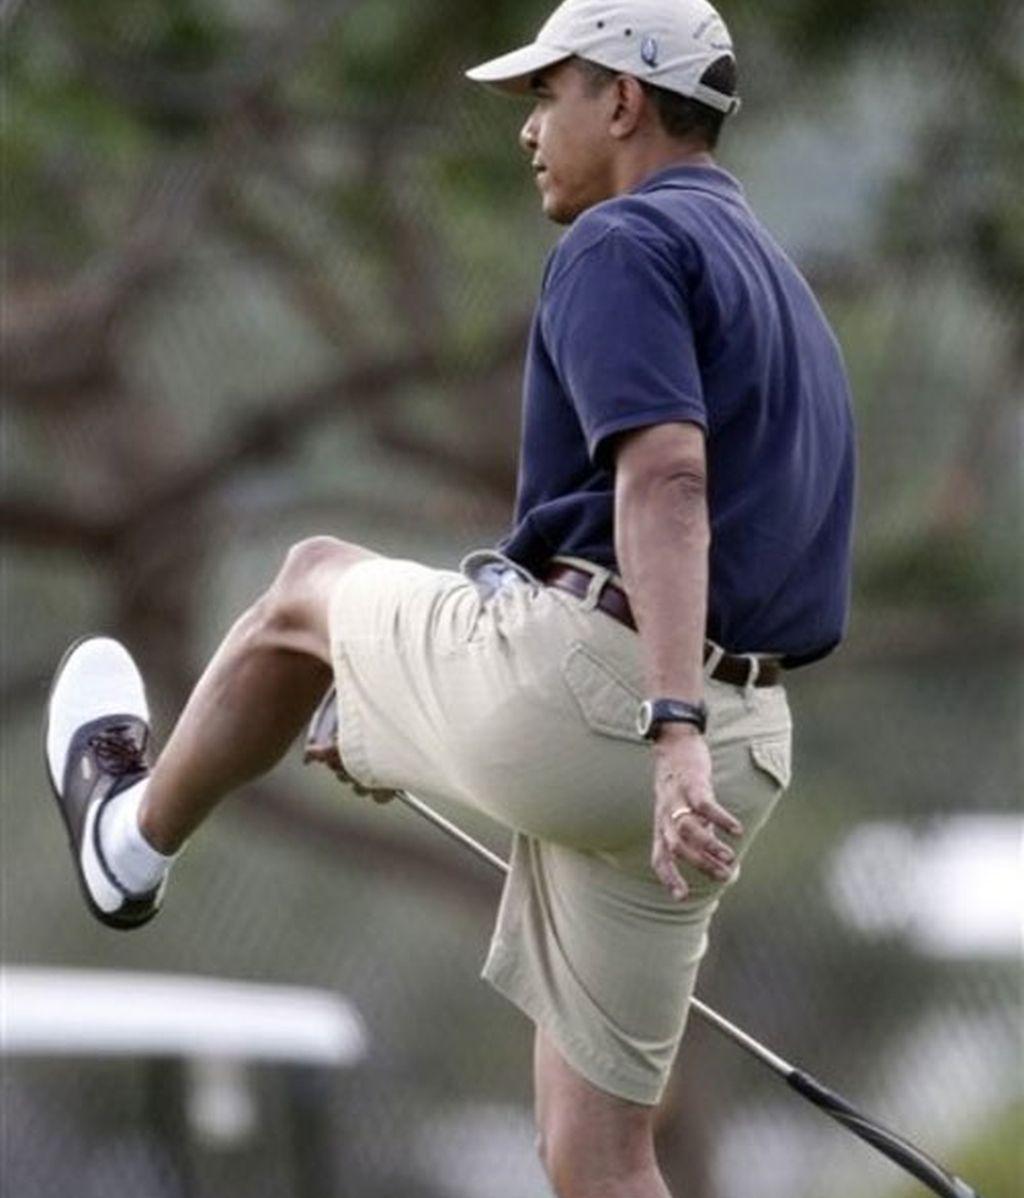 Obama juega al golf